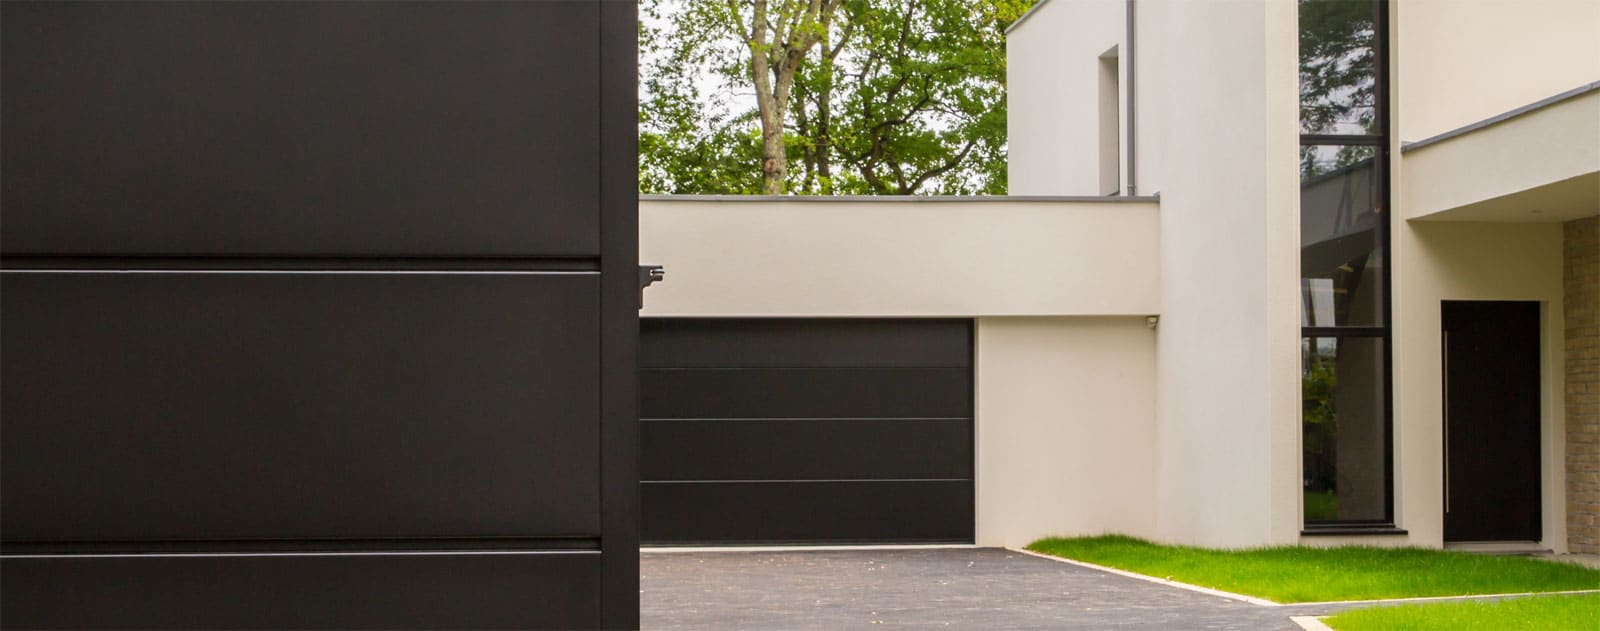 api 44 vertou portail motorisation porte de garage. Black Bedroom Furniture Sets. Home Design Ideas